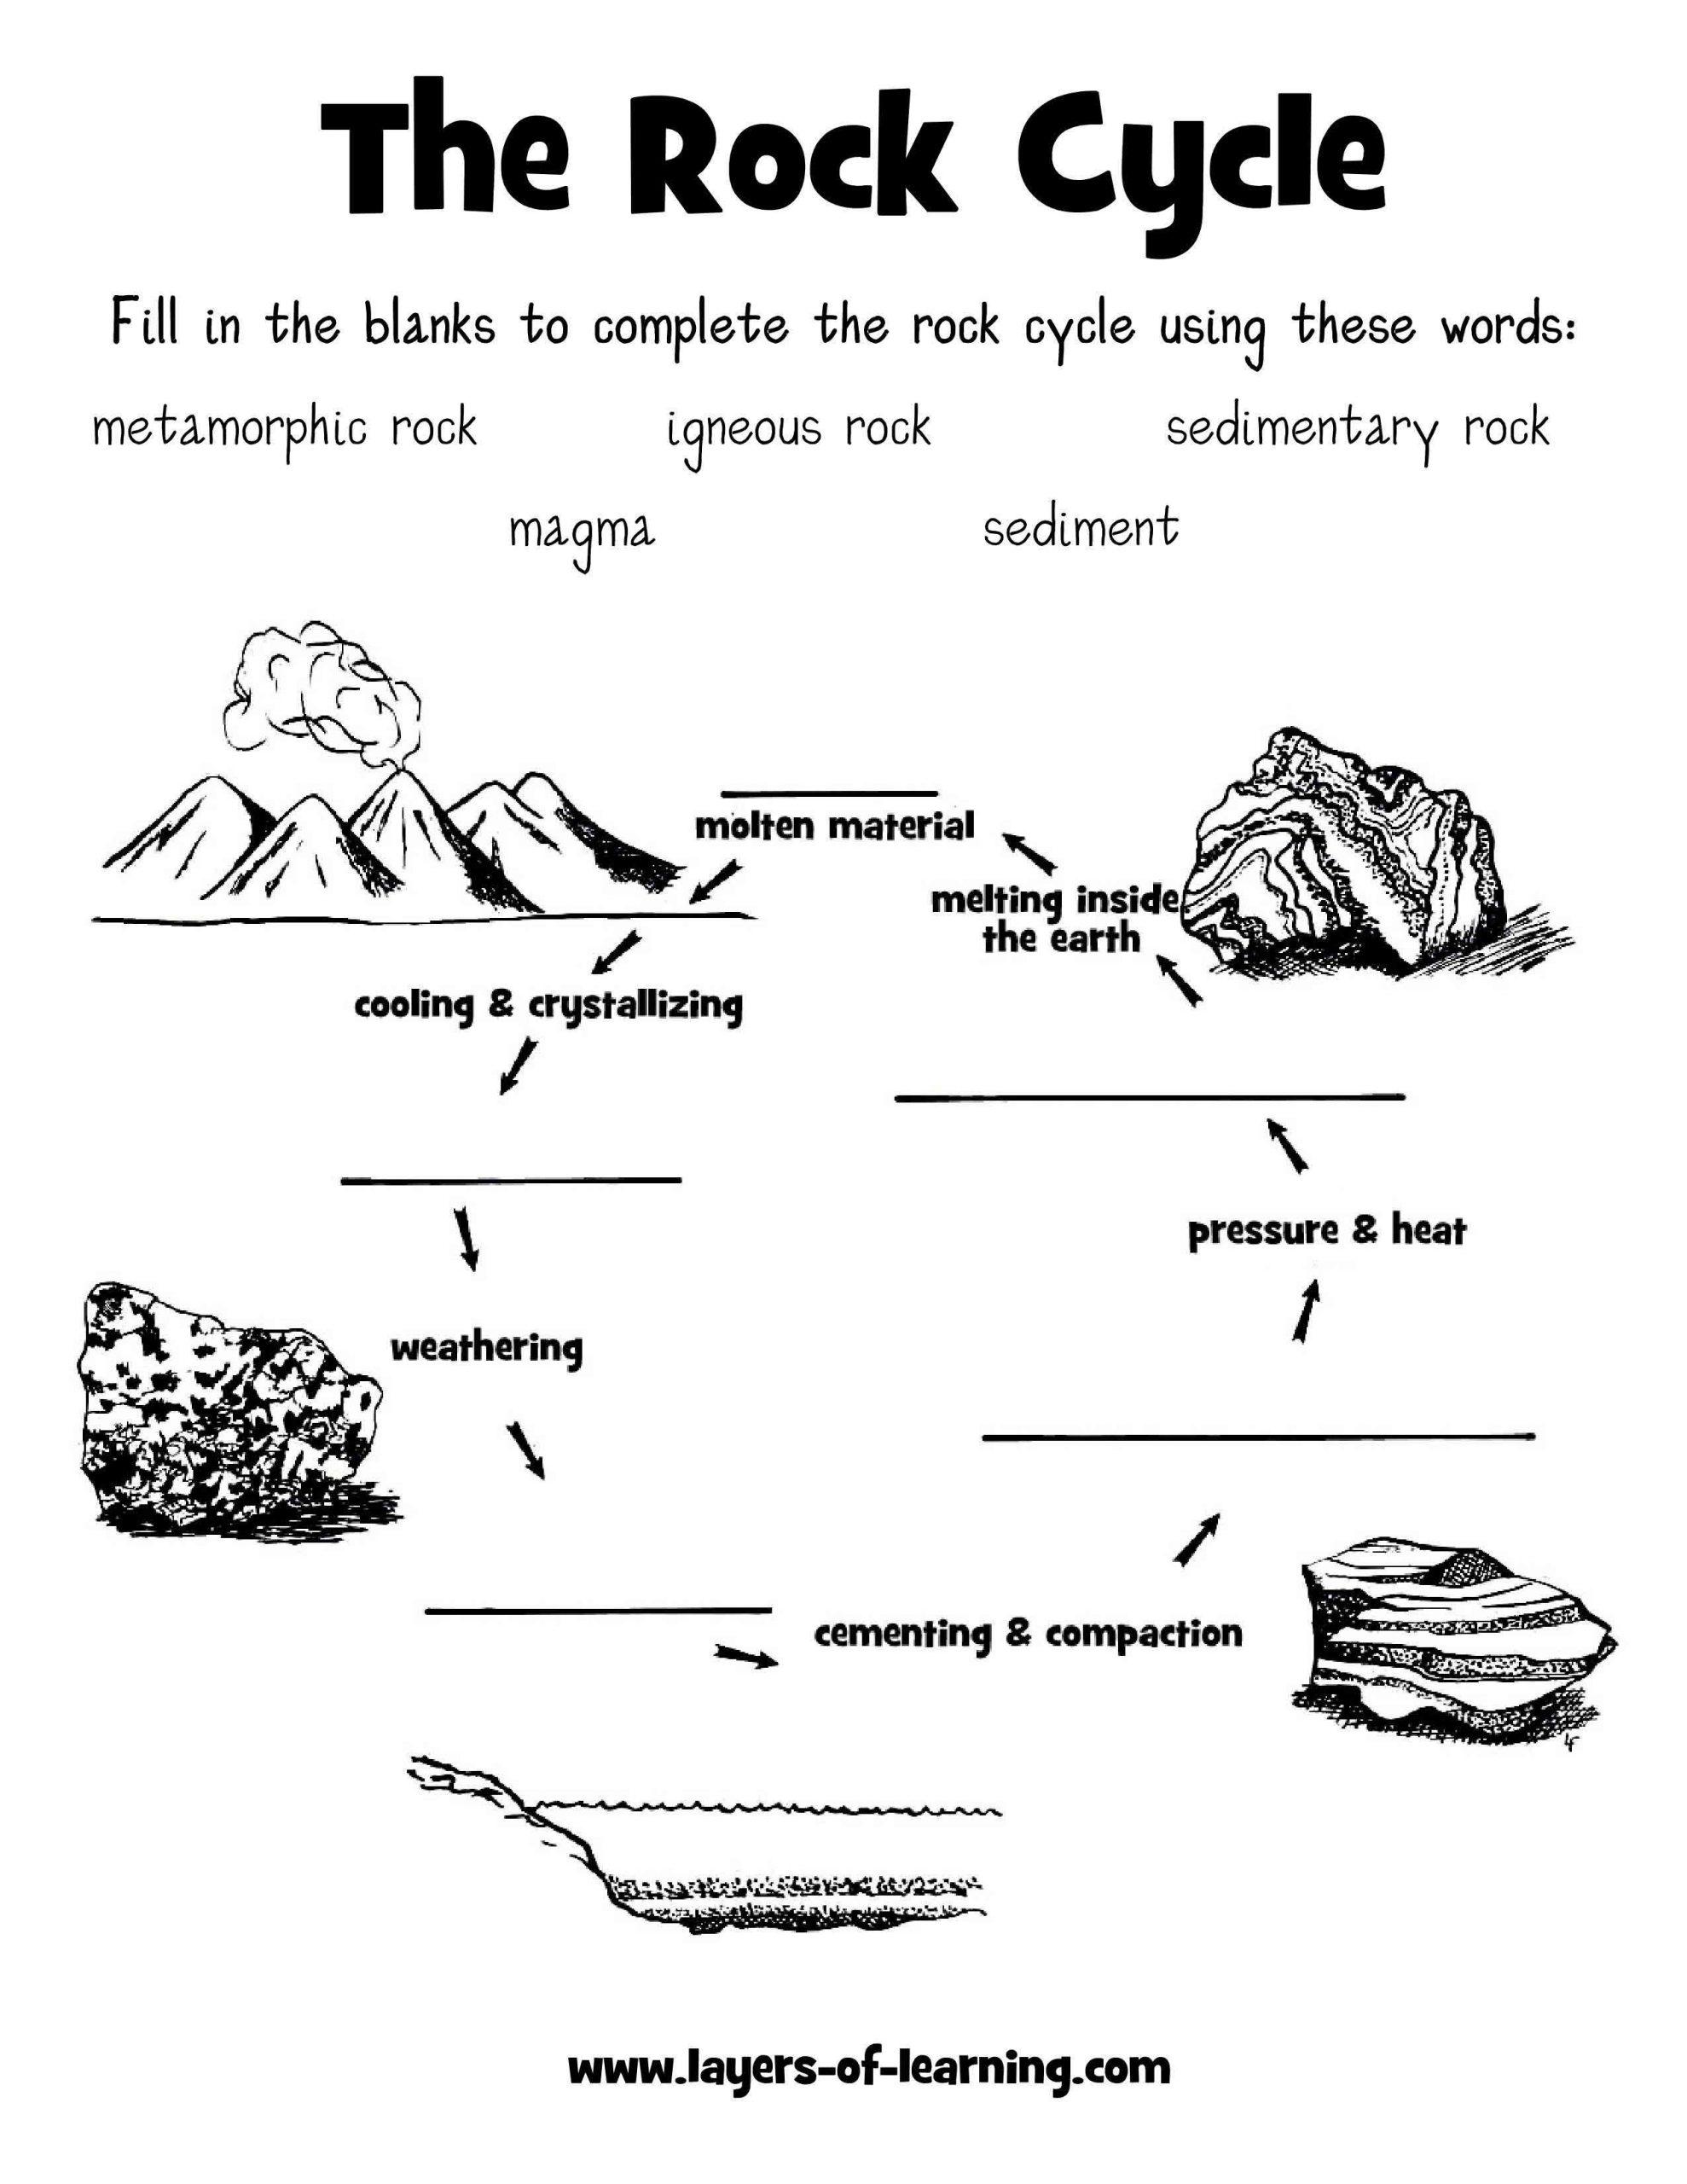 Rock Cycle Diagram Worksheet Rock Cycle Worksheet Layers Of Learning